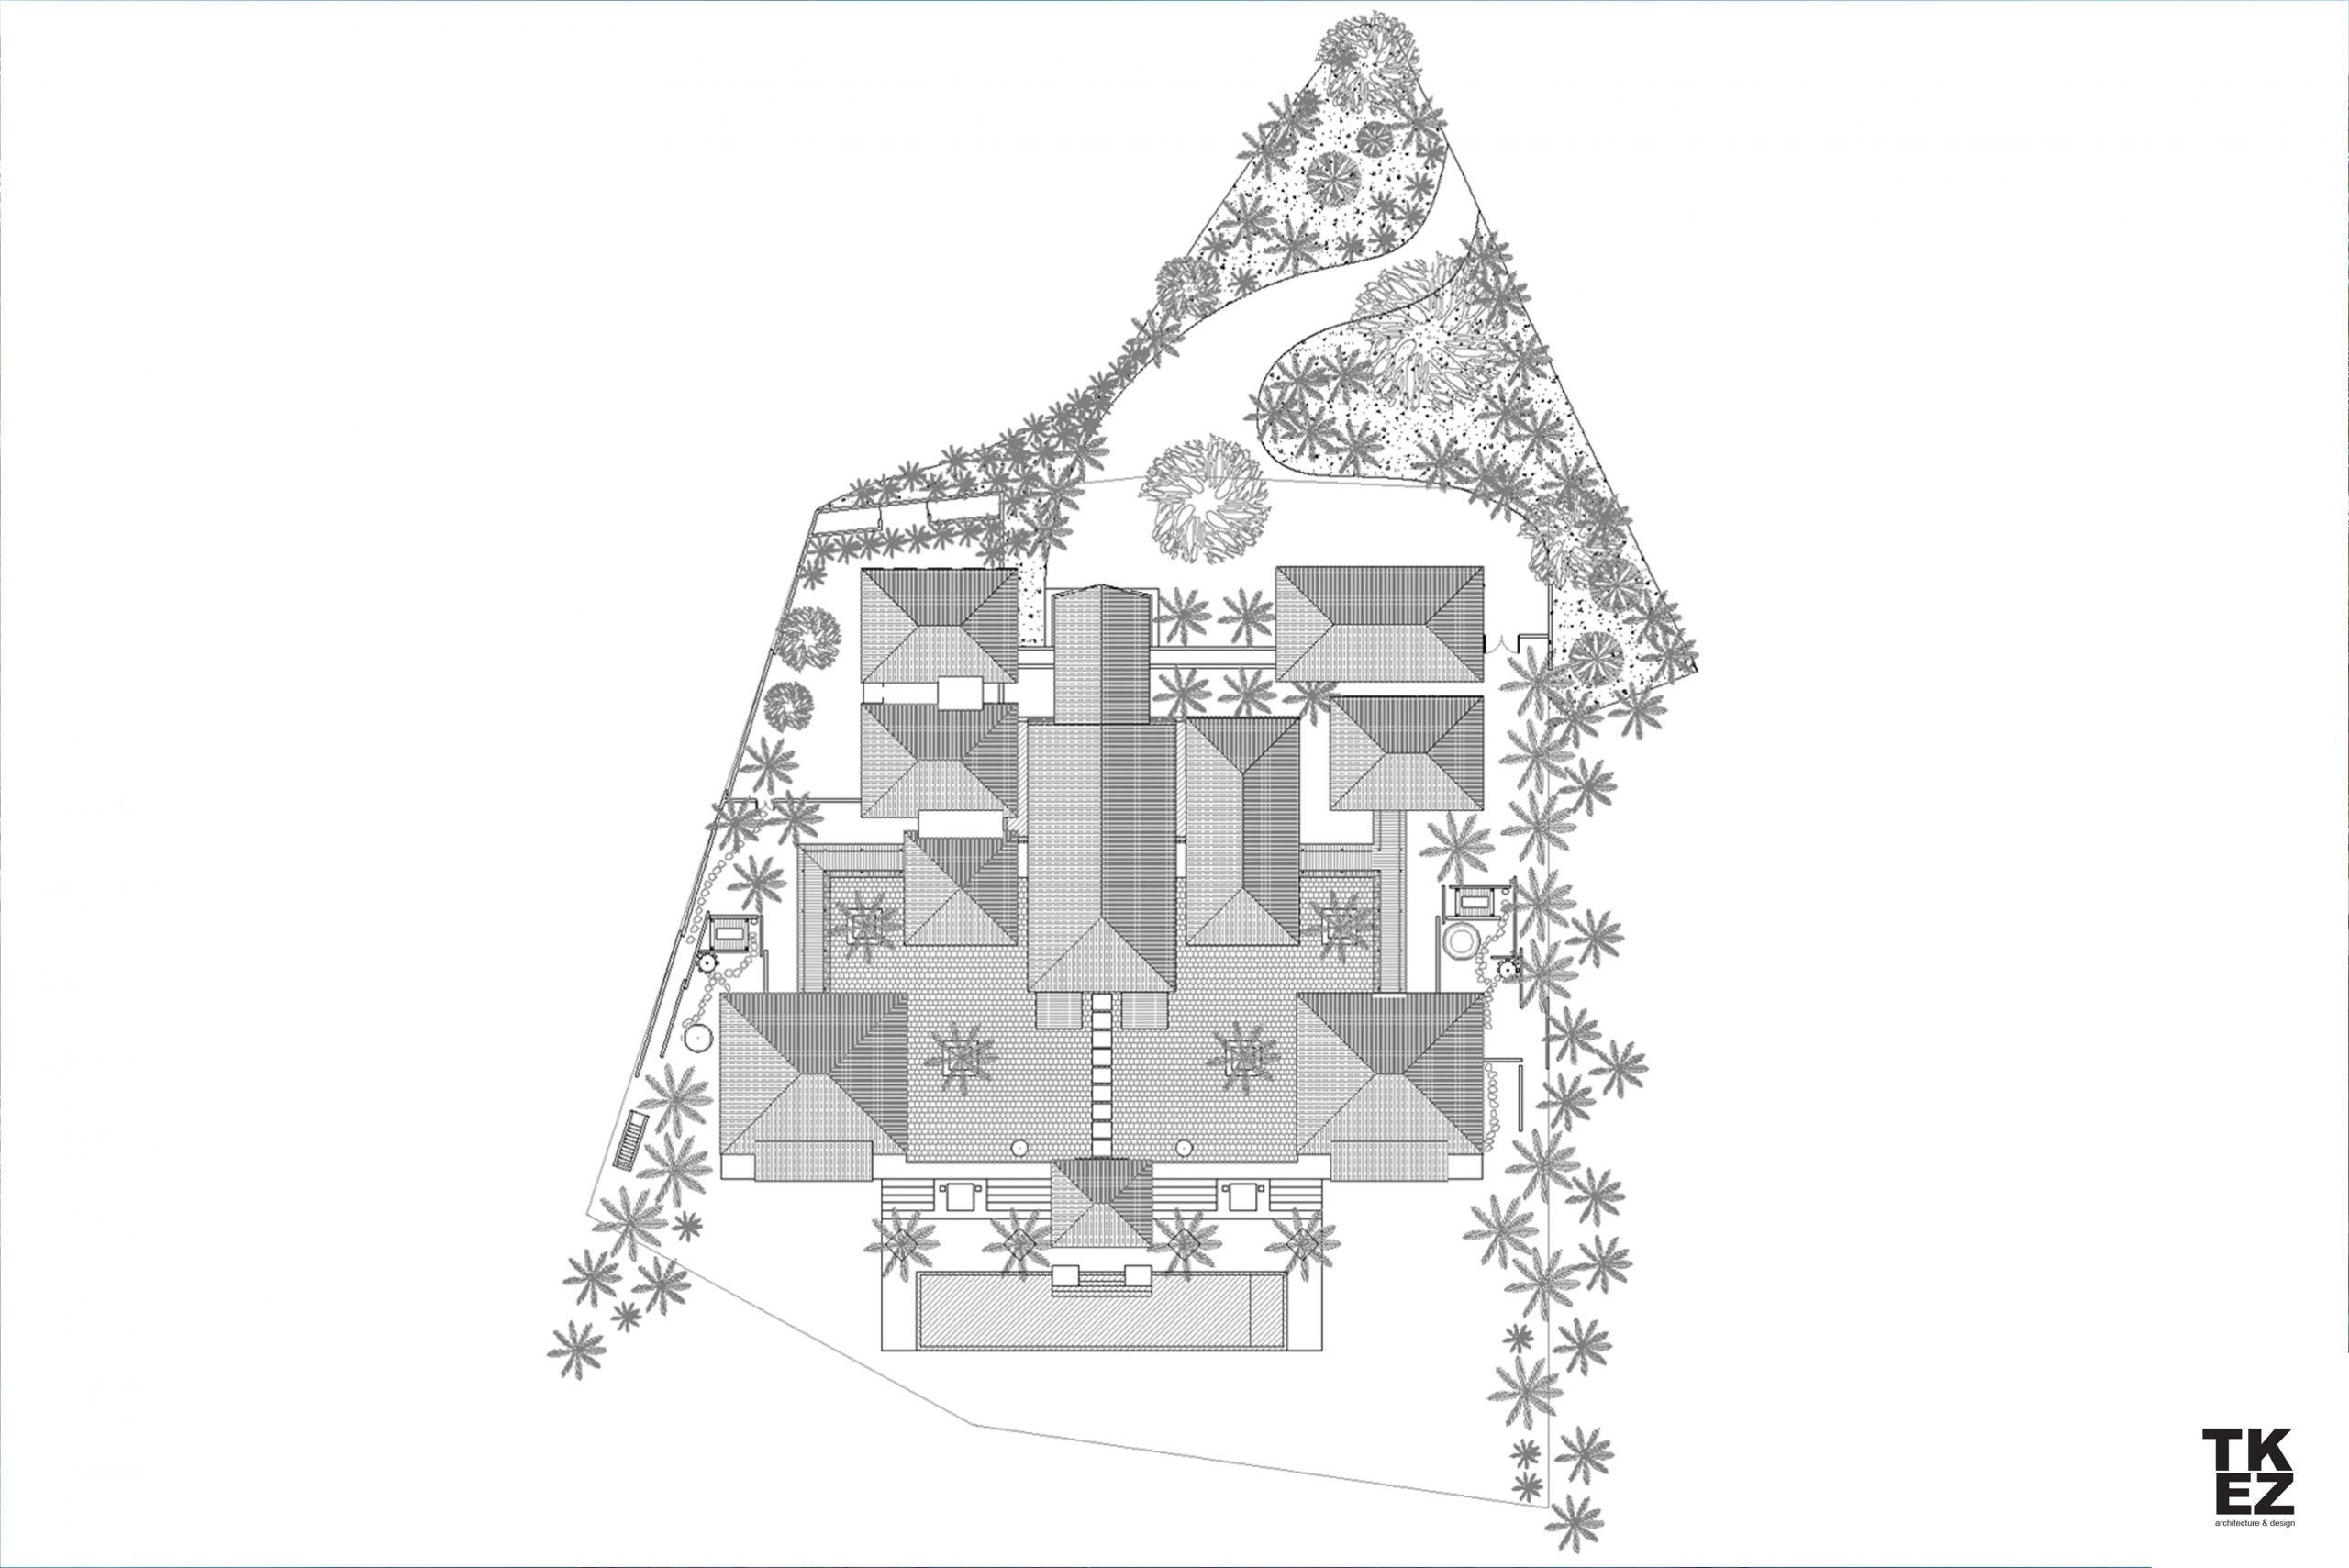 Exklusive Wohnresidenz Architekturbüro TKEZ Architekten Dach Planung